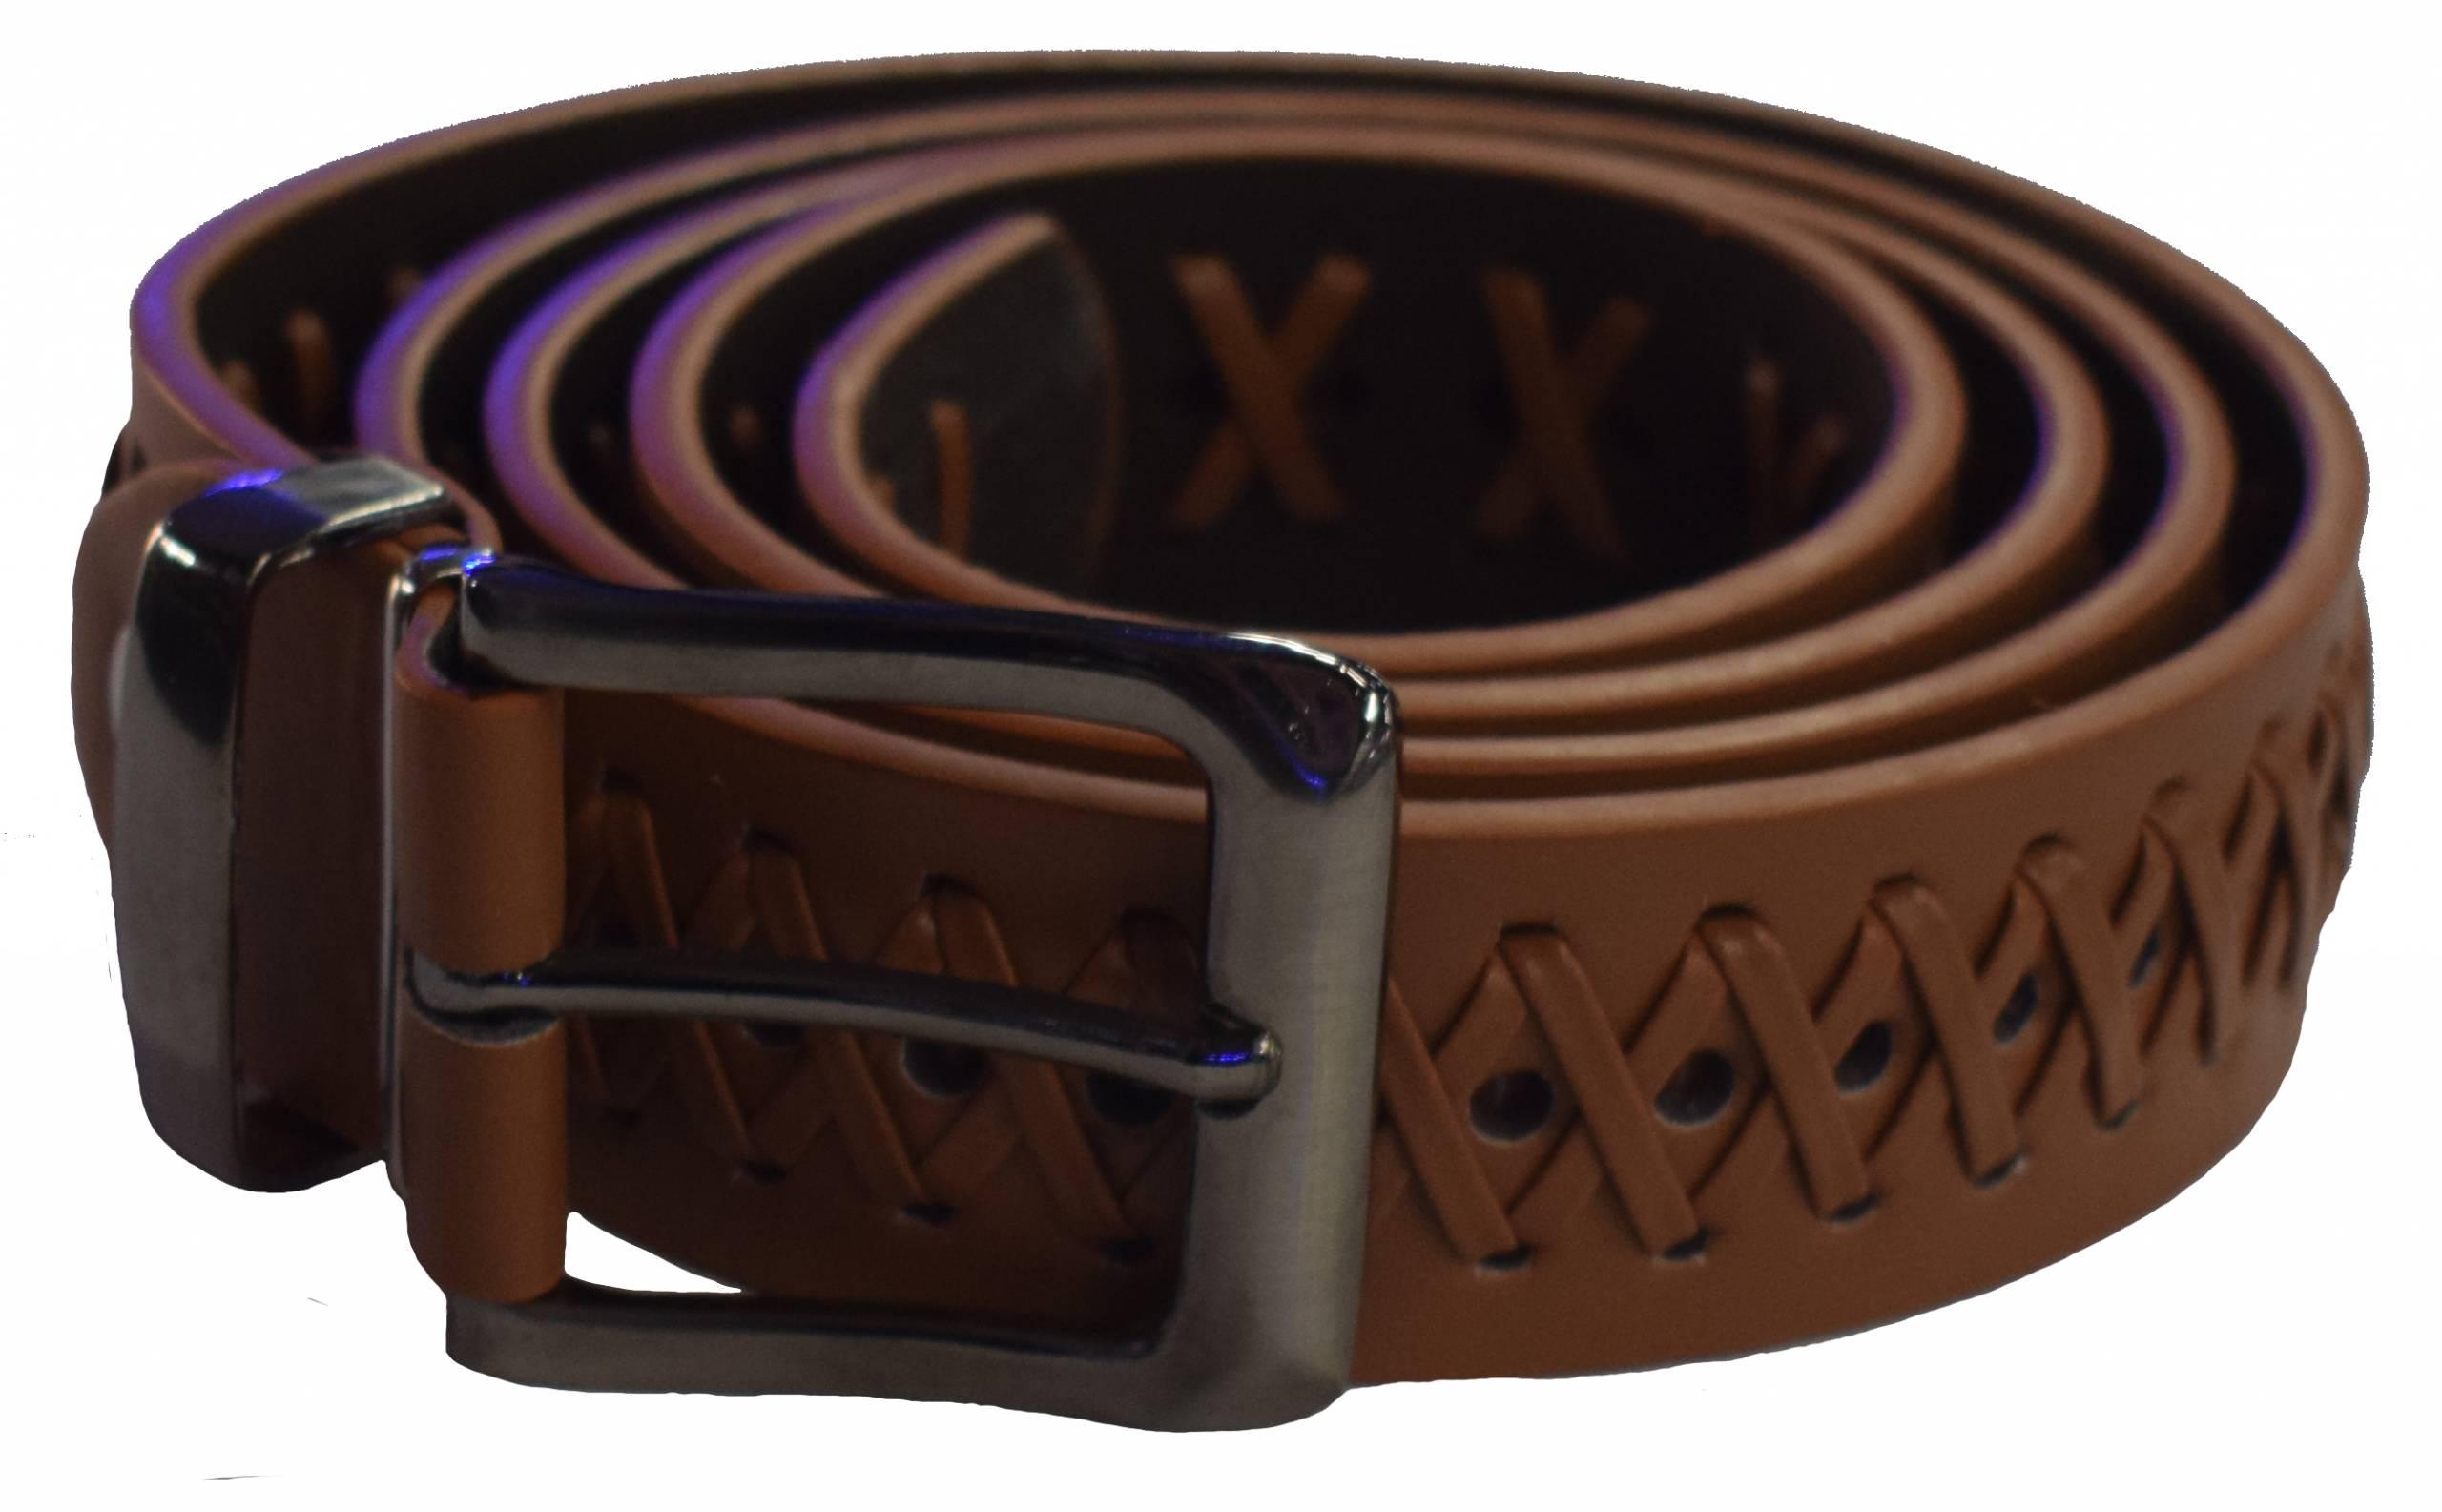 HAWKDALE LEATHER CROSS HATCH BELT BROWN product image